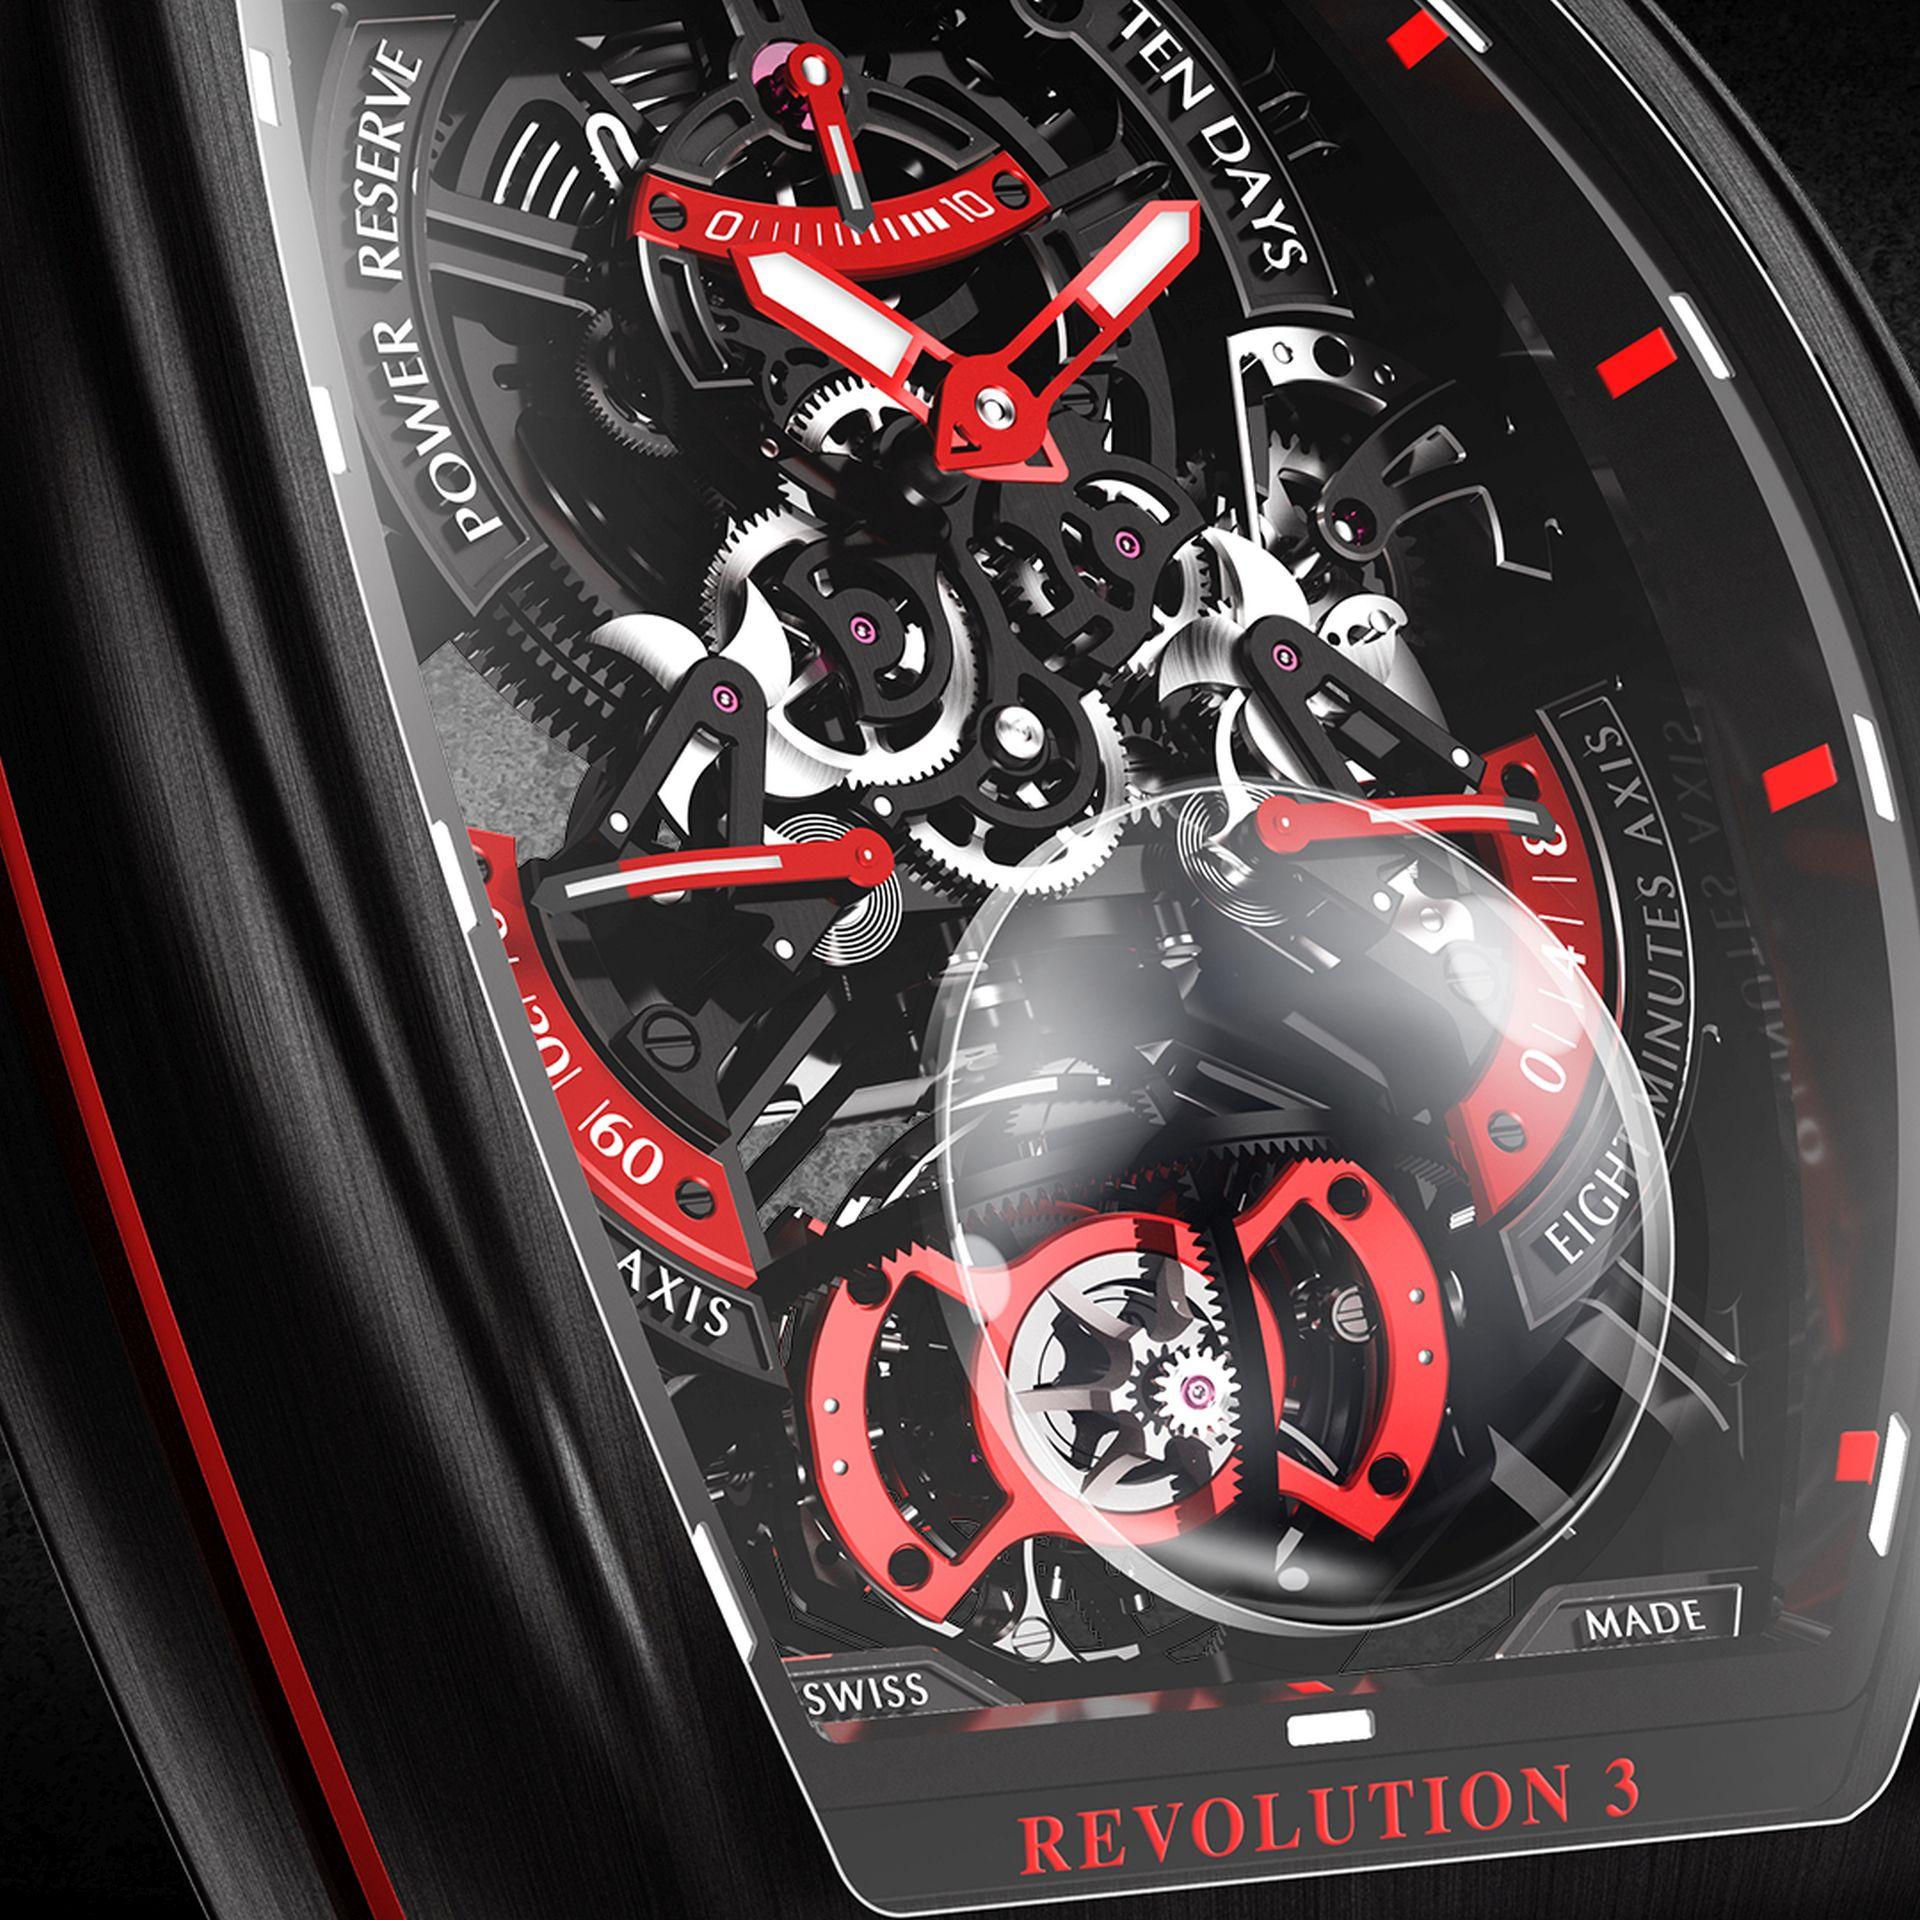 Franck Muller Vanguard™ Revolution 3 Skeleton